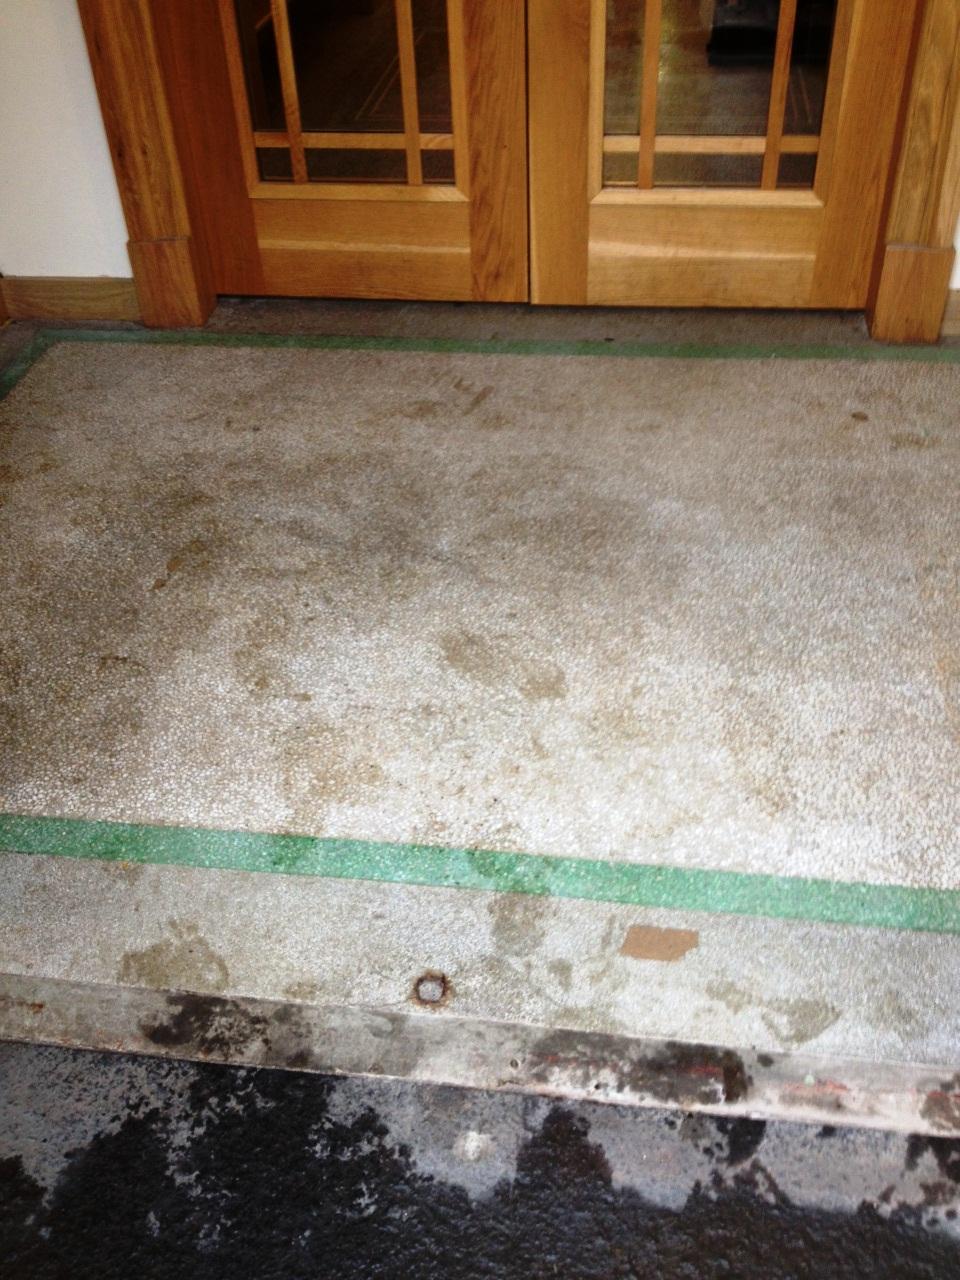 School Terrazzo Floor Kilmacolm before cleaning